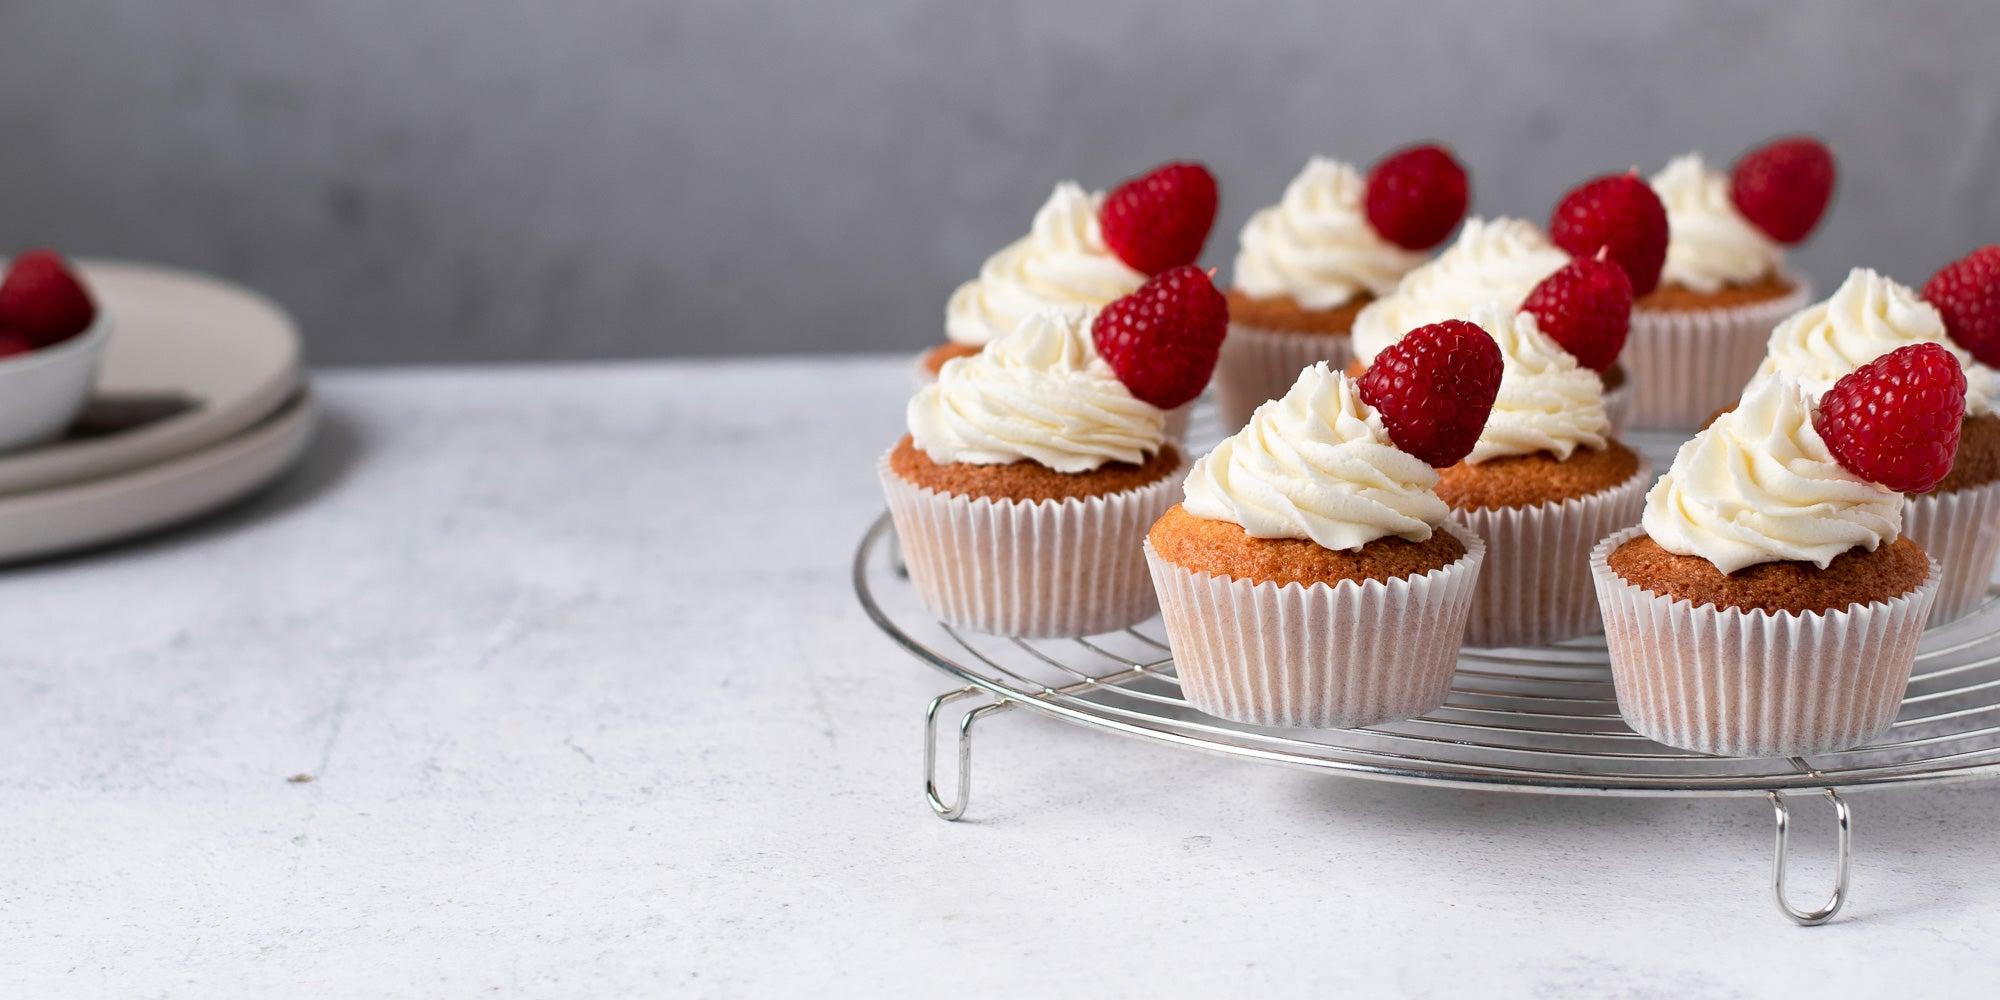 Cosmopolitan Cocktail Cupcakes